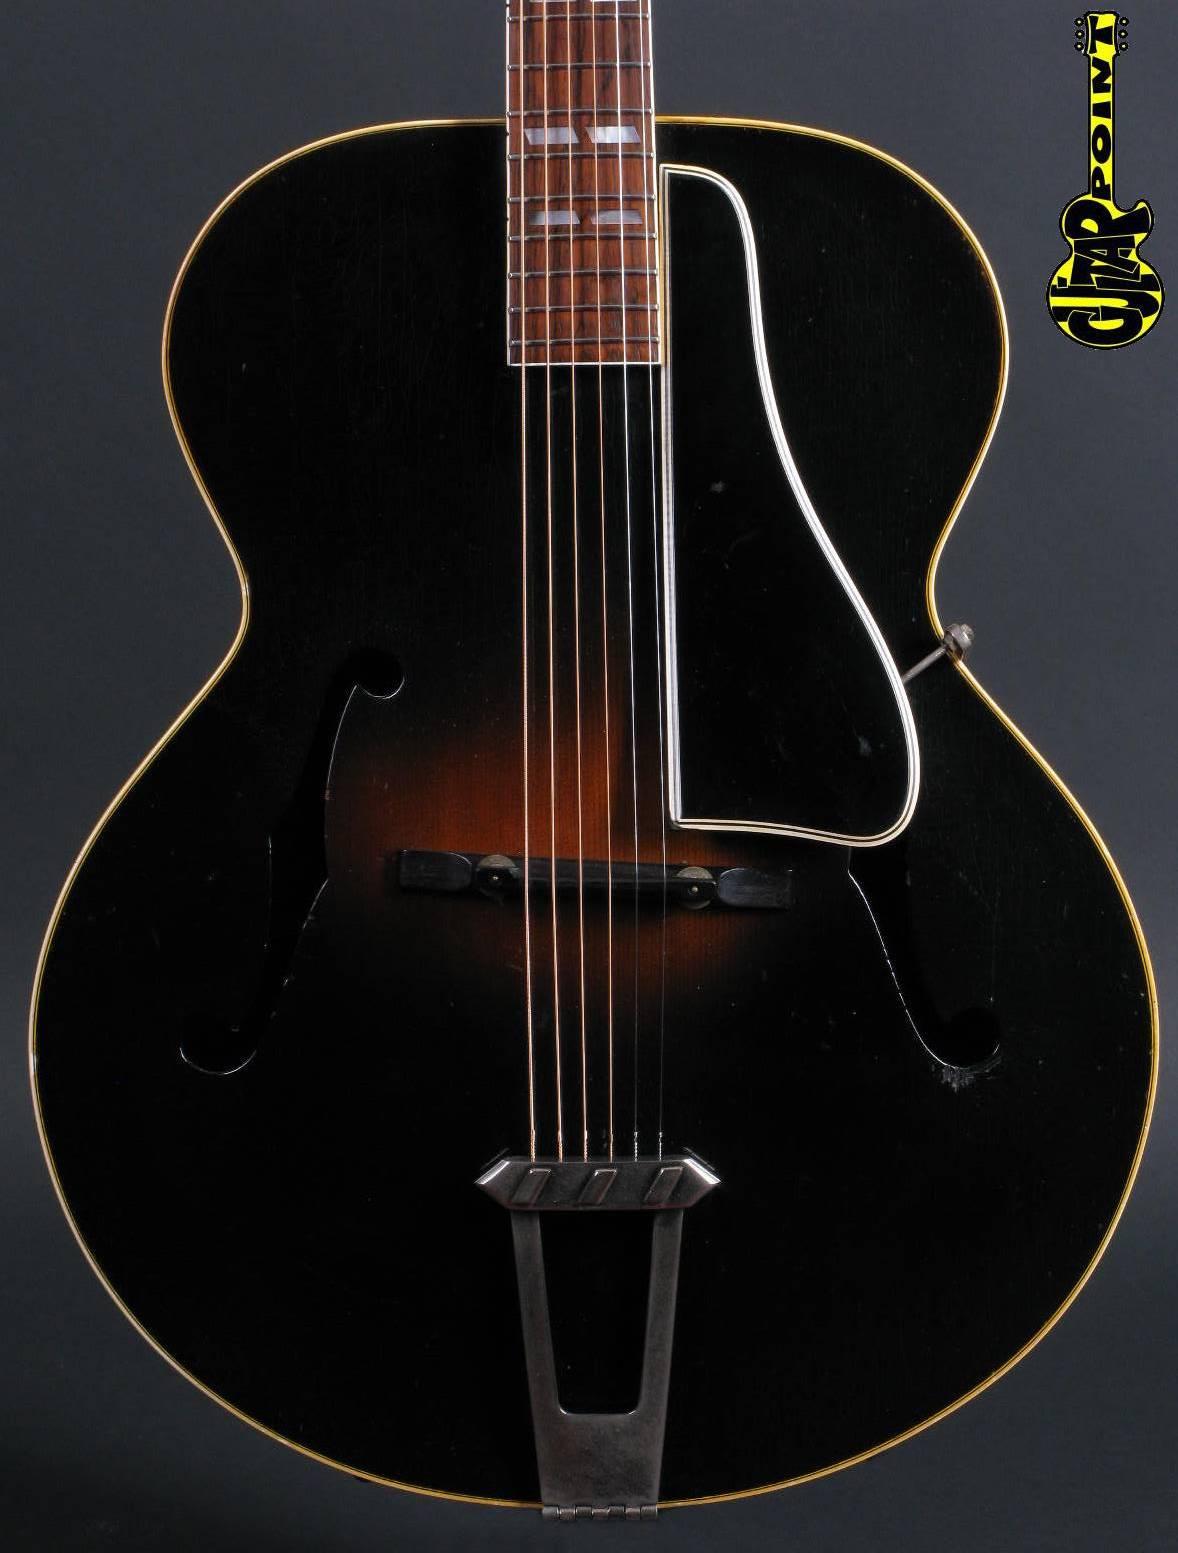 1940 Gibson L-7 - Sunburst